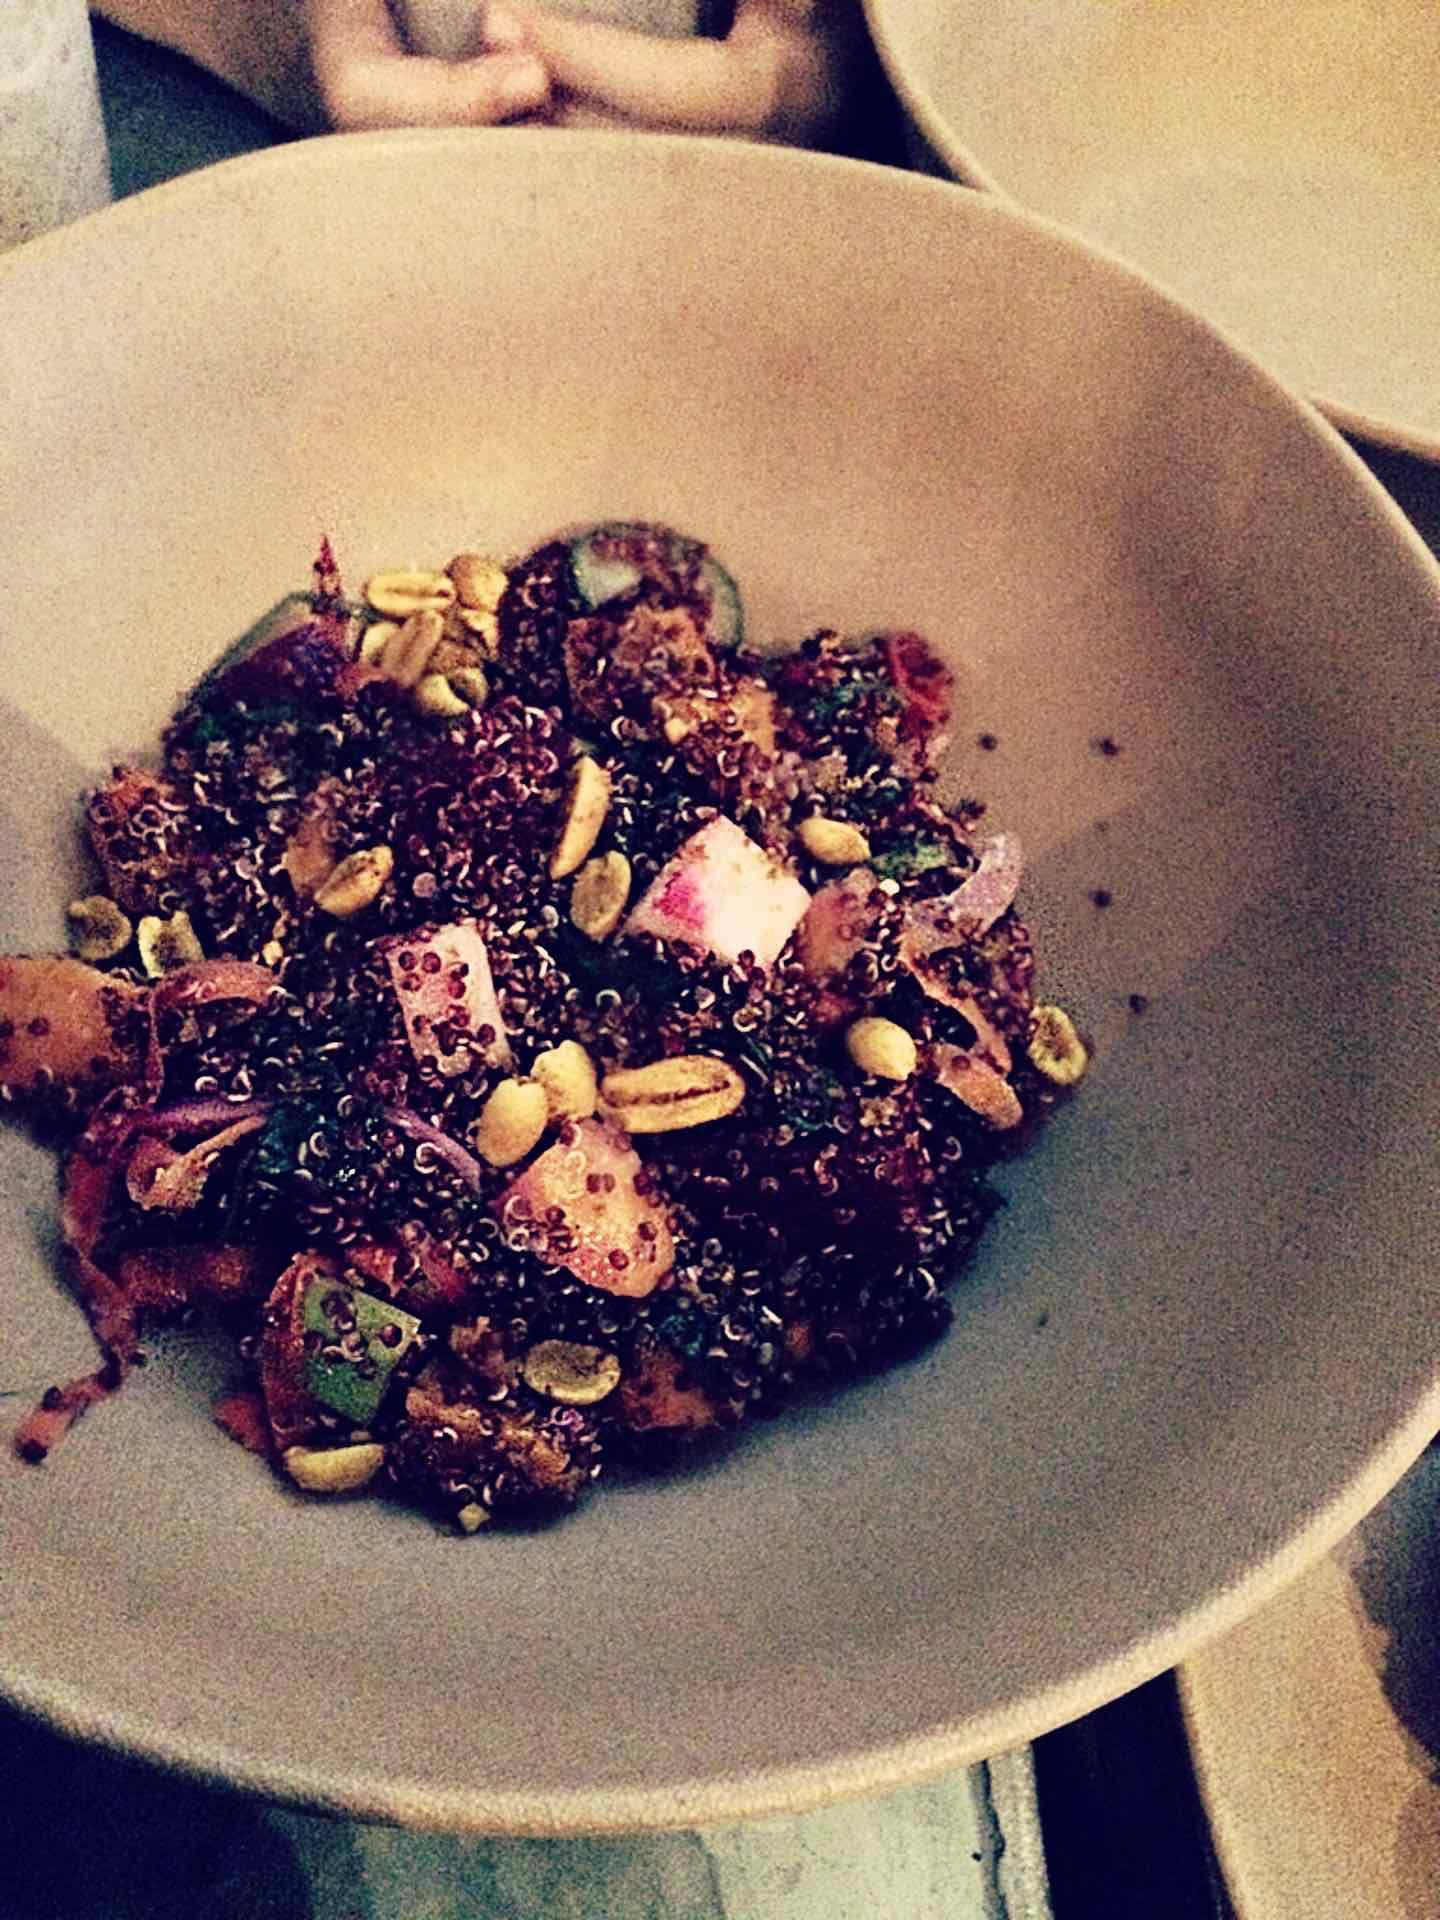 the quinoa bowl - Kate Haritos.jpeg